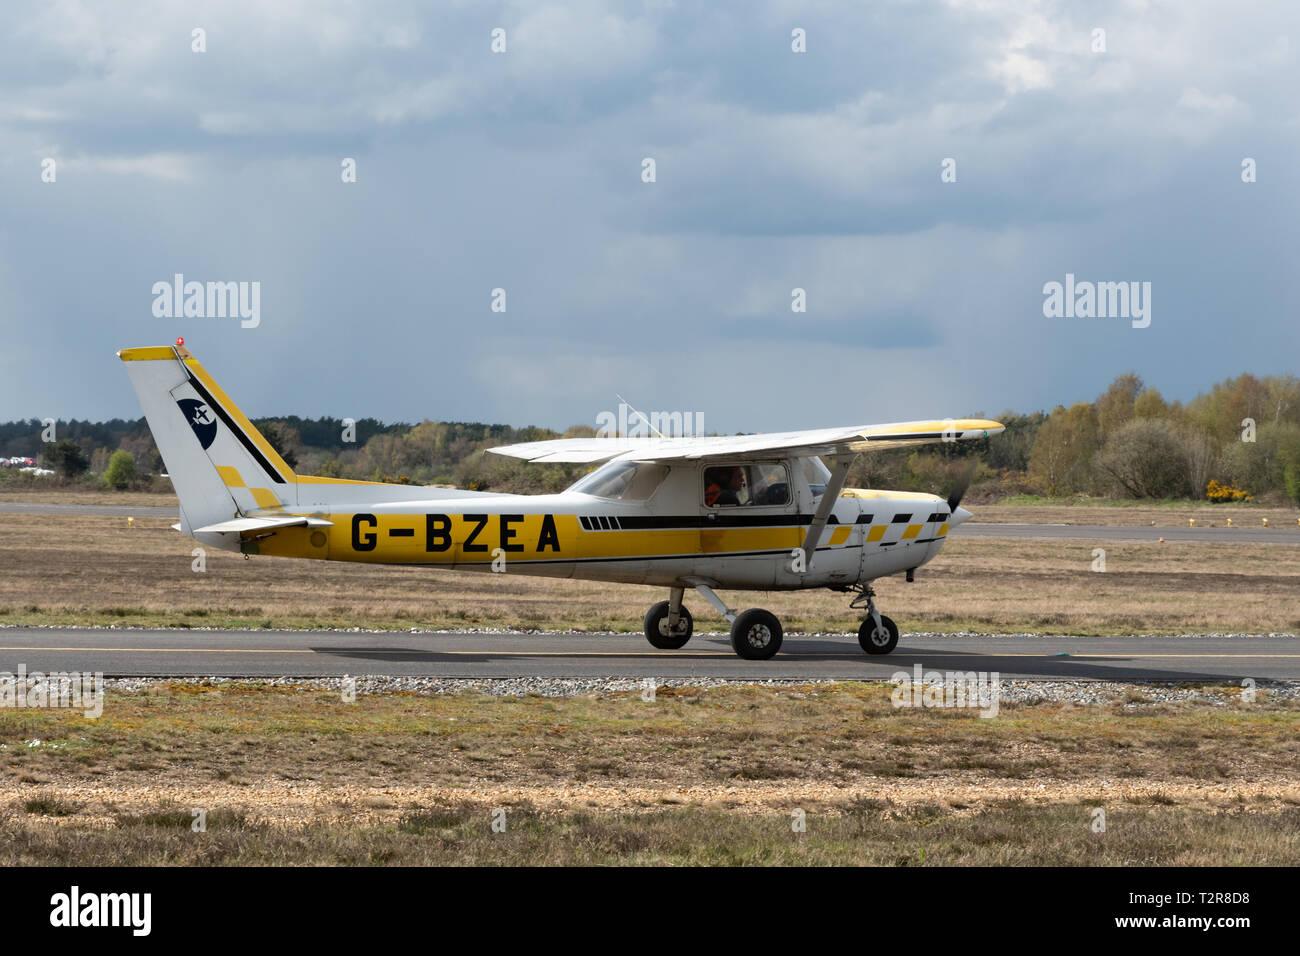 Cessna A152 Aerobat G-BZEA, a single-engine two-seat high-wing aerobatic-capable monoplane or airplane preparing to take off at Blackbushe Airport, UK - Stock Image